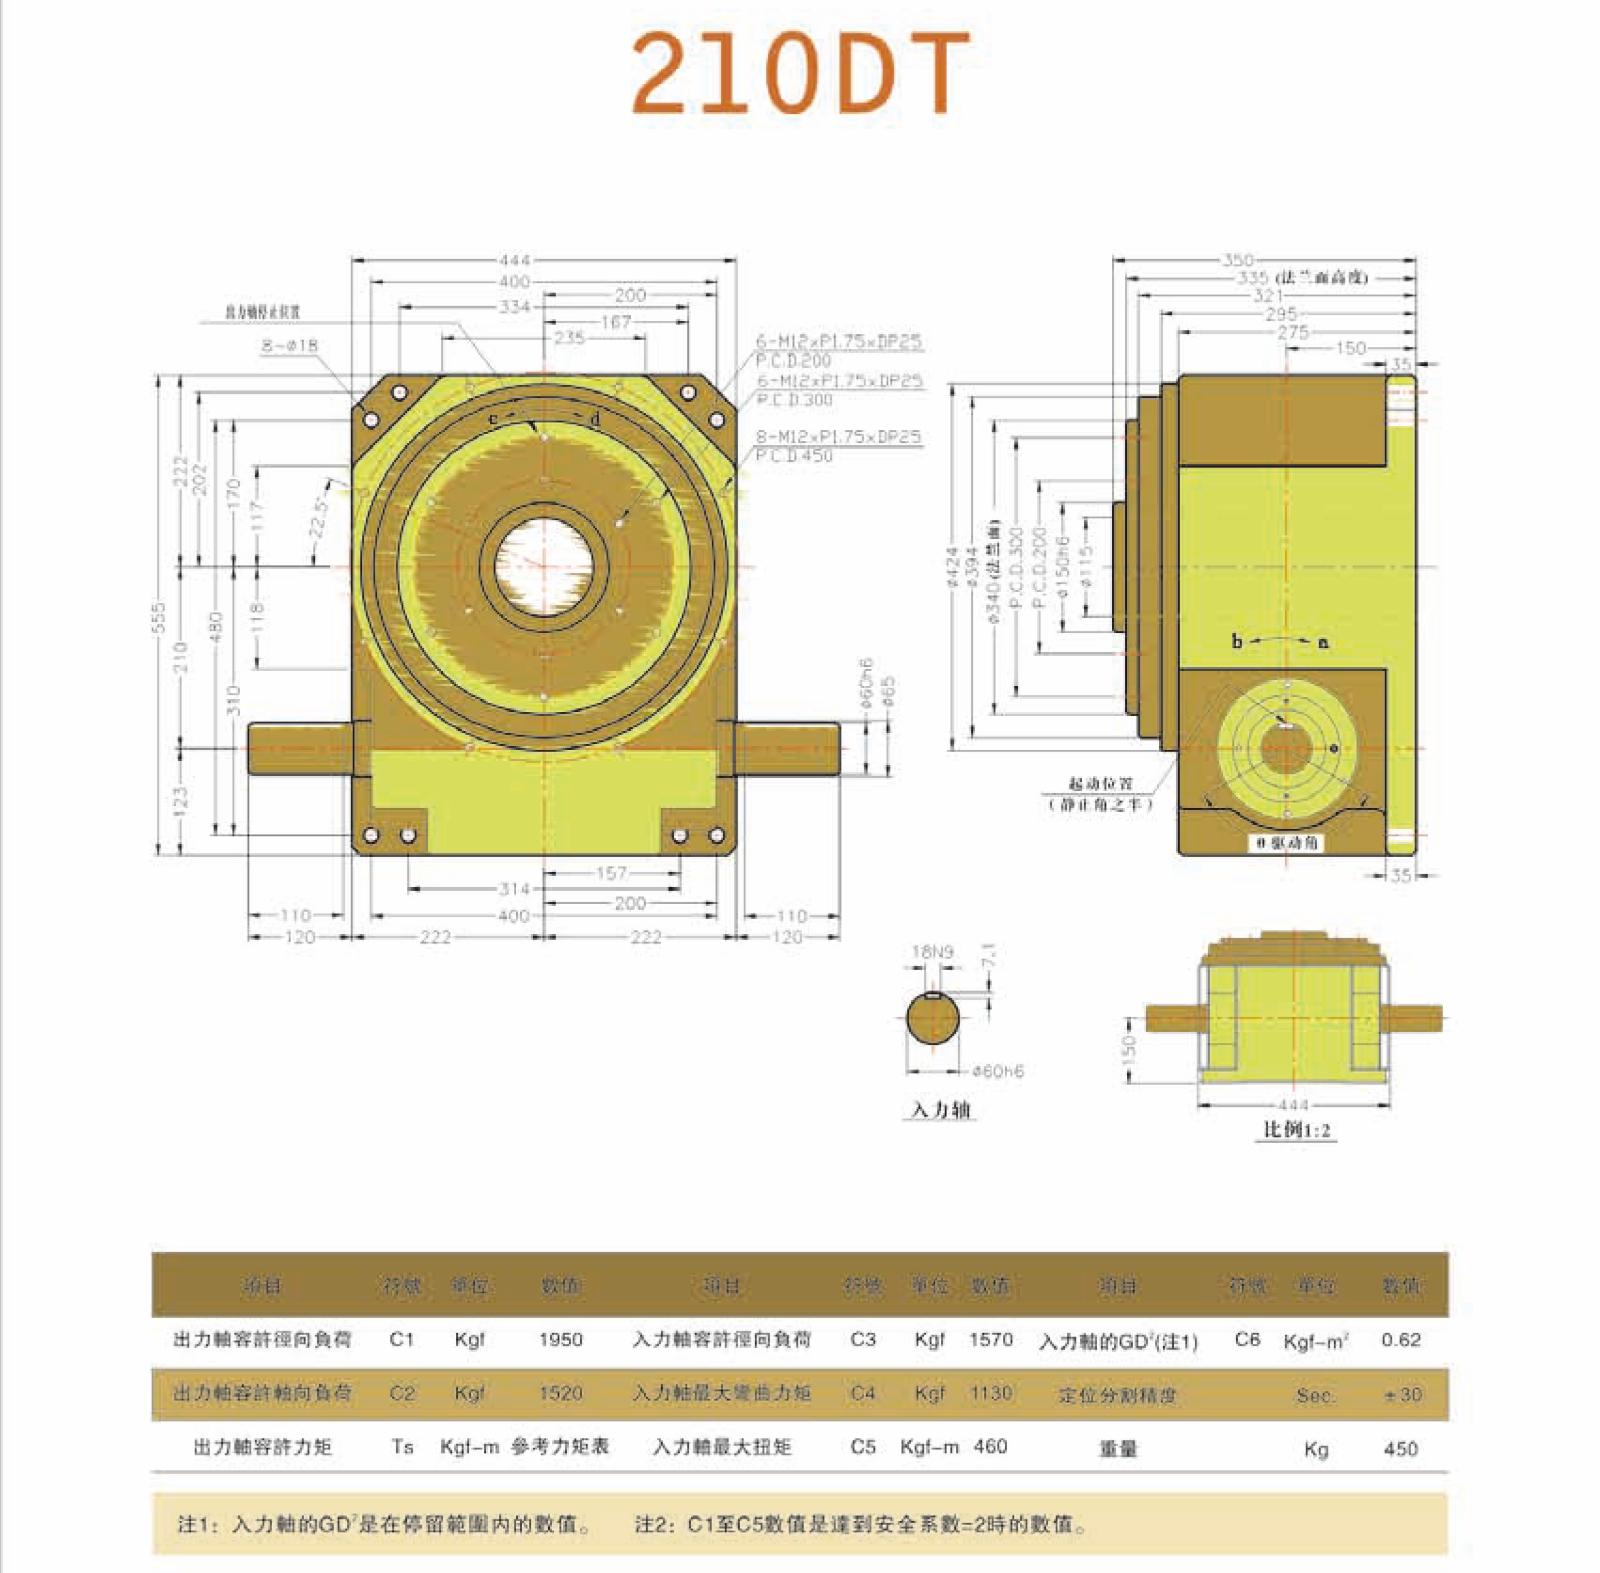 DT平台桌面型分割器